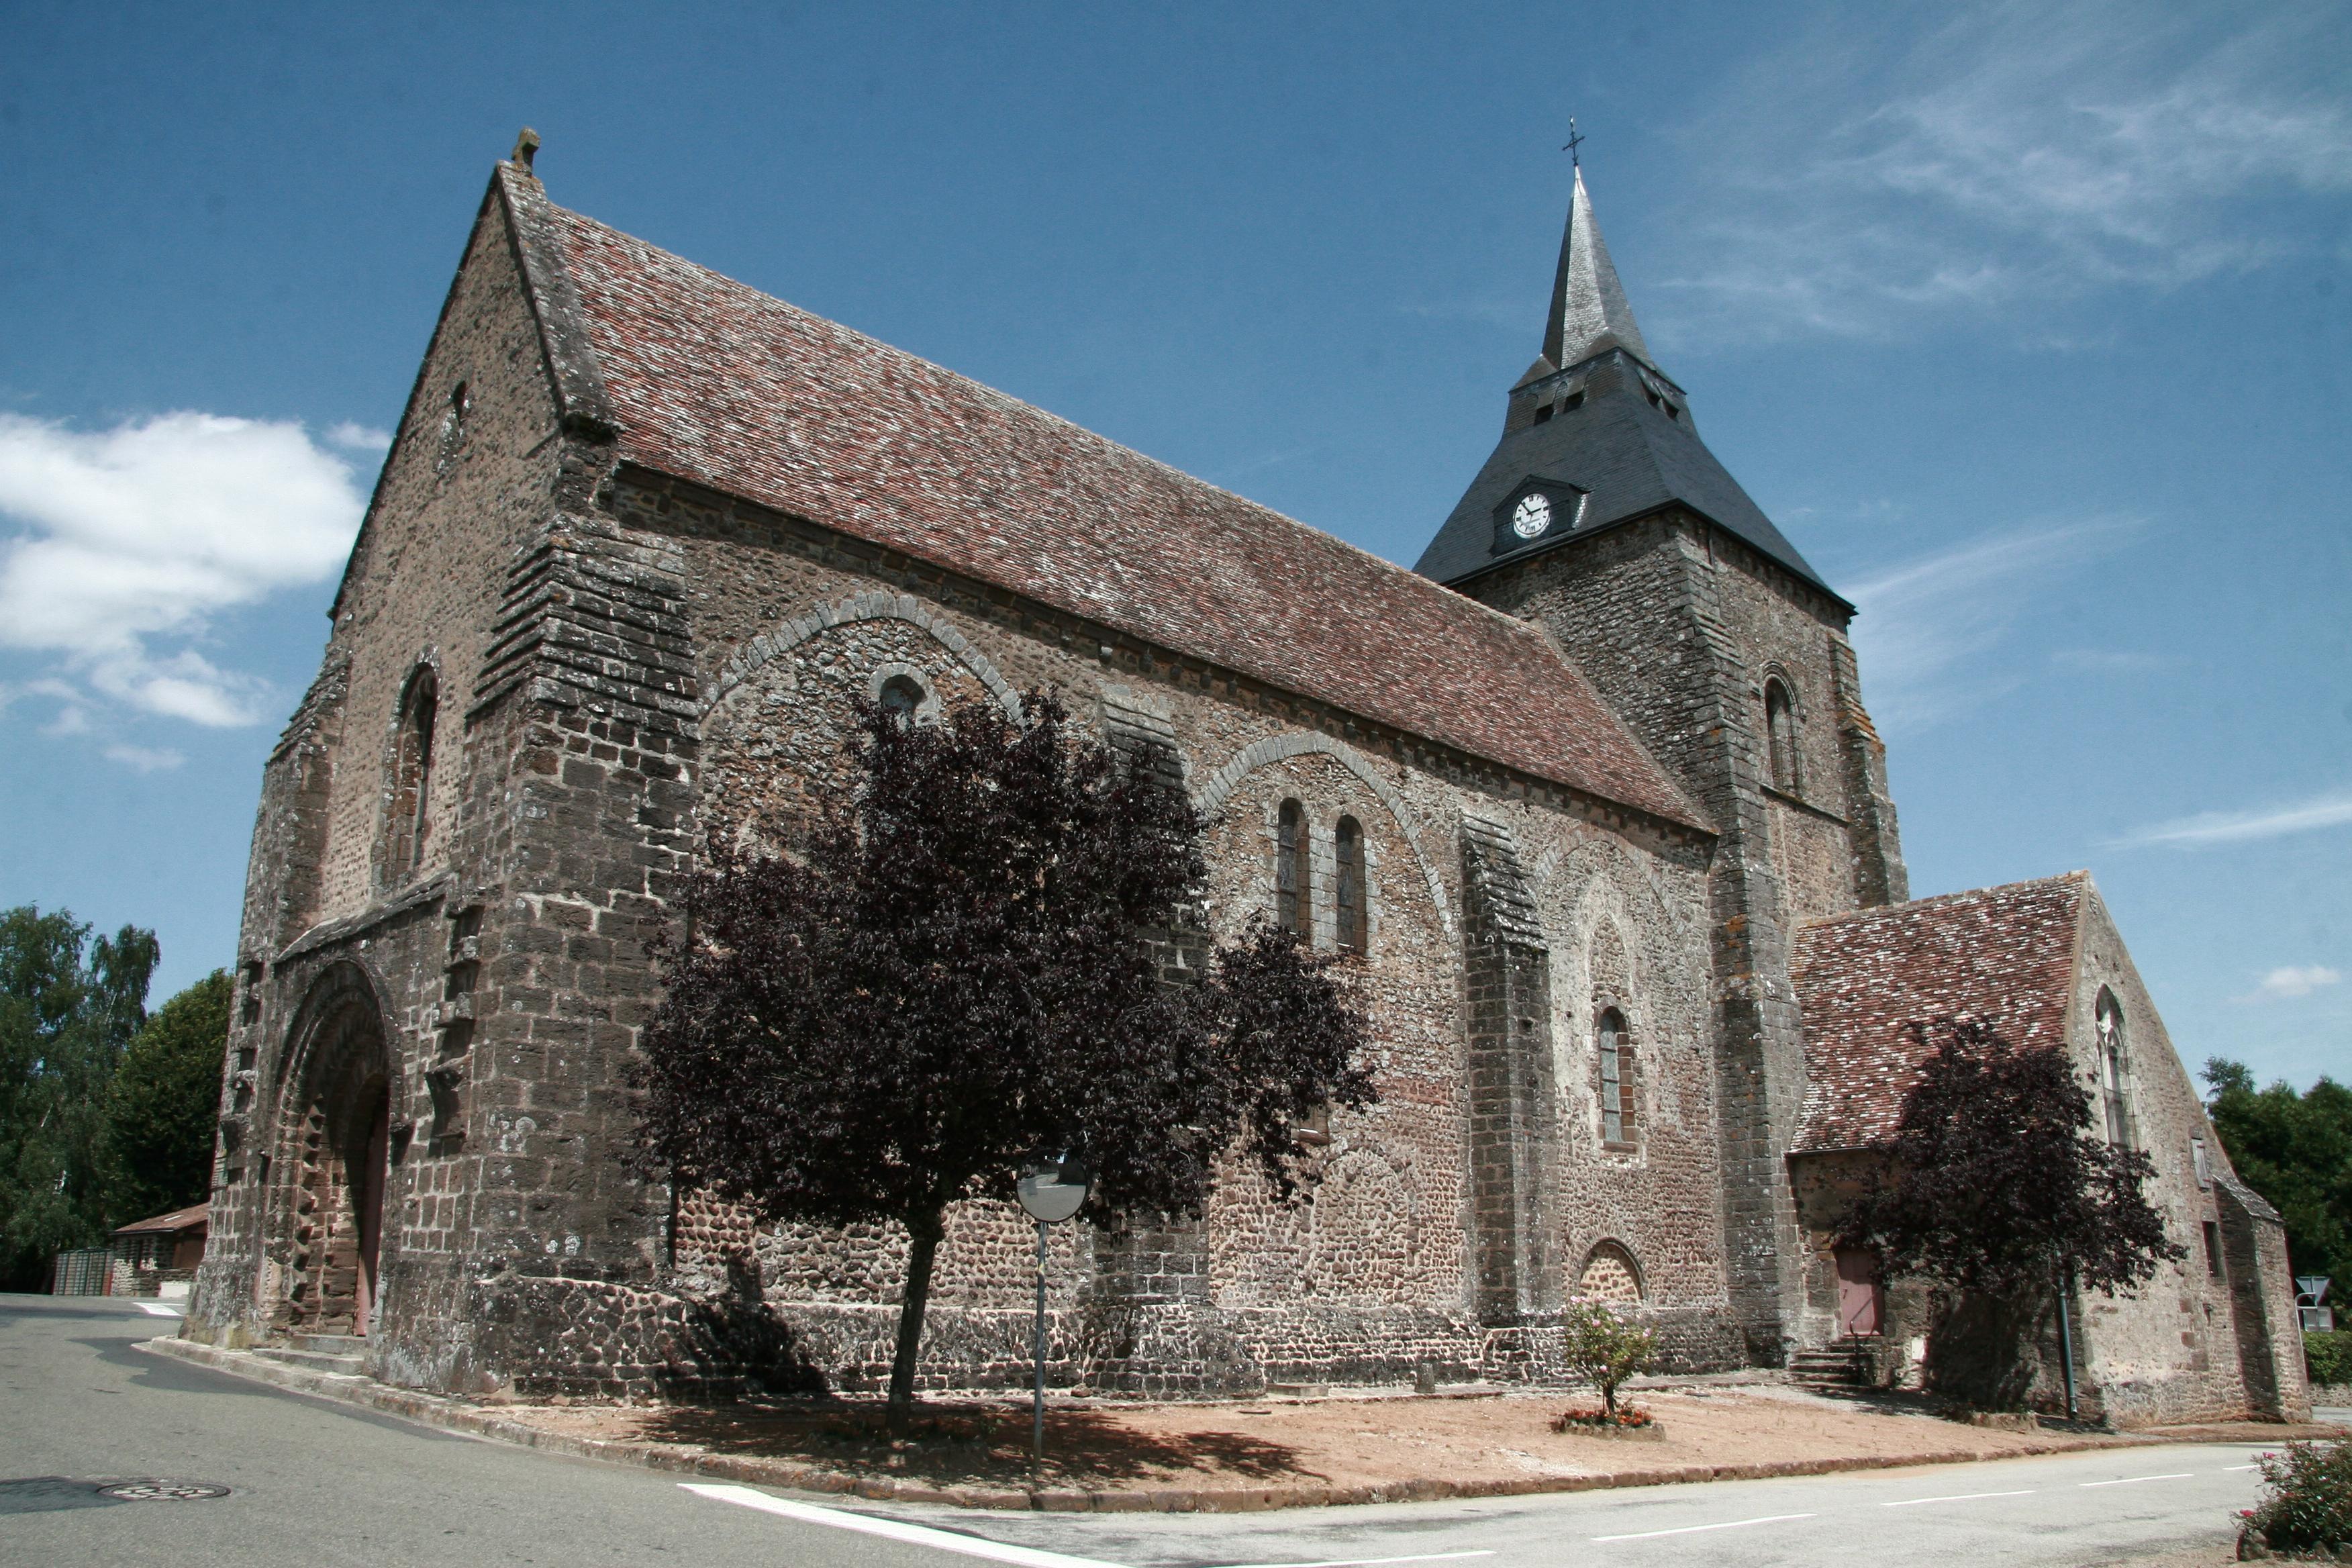 Saint-Christophe-du-Jambet